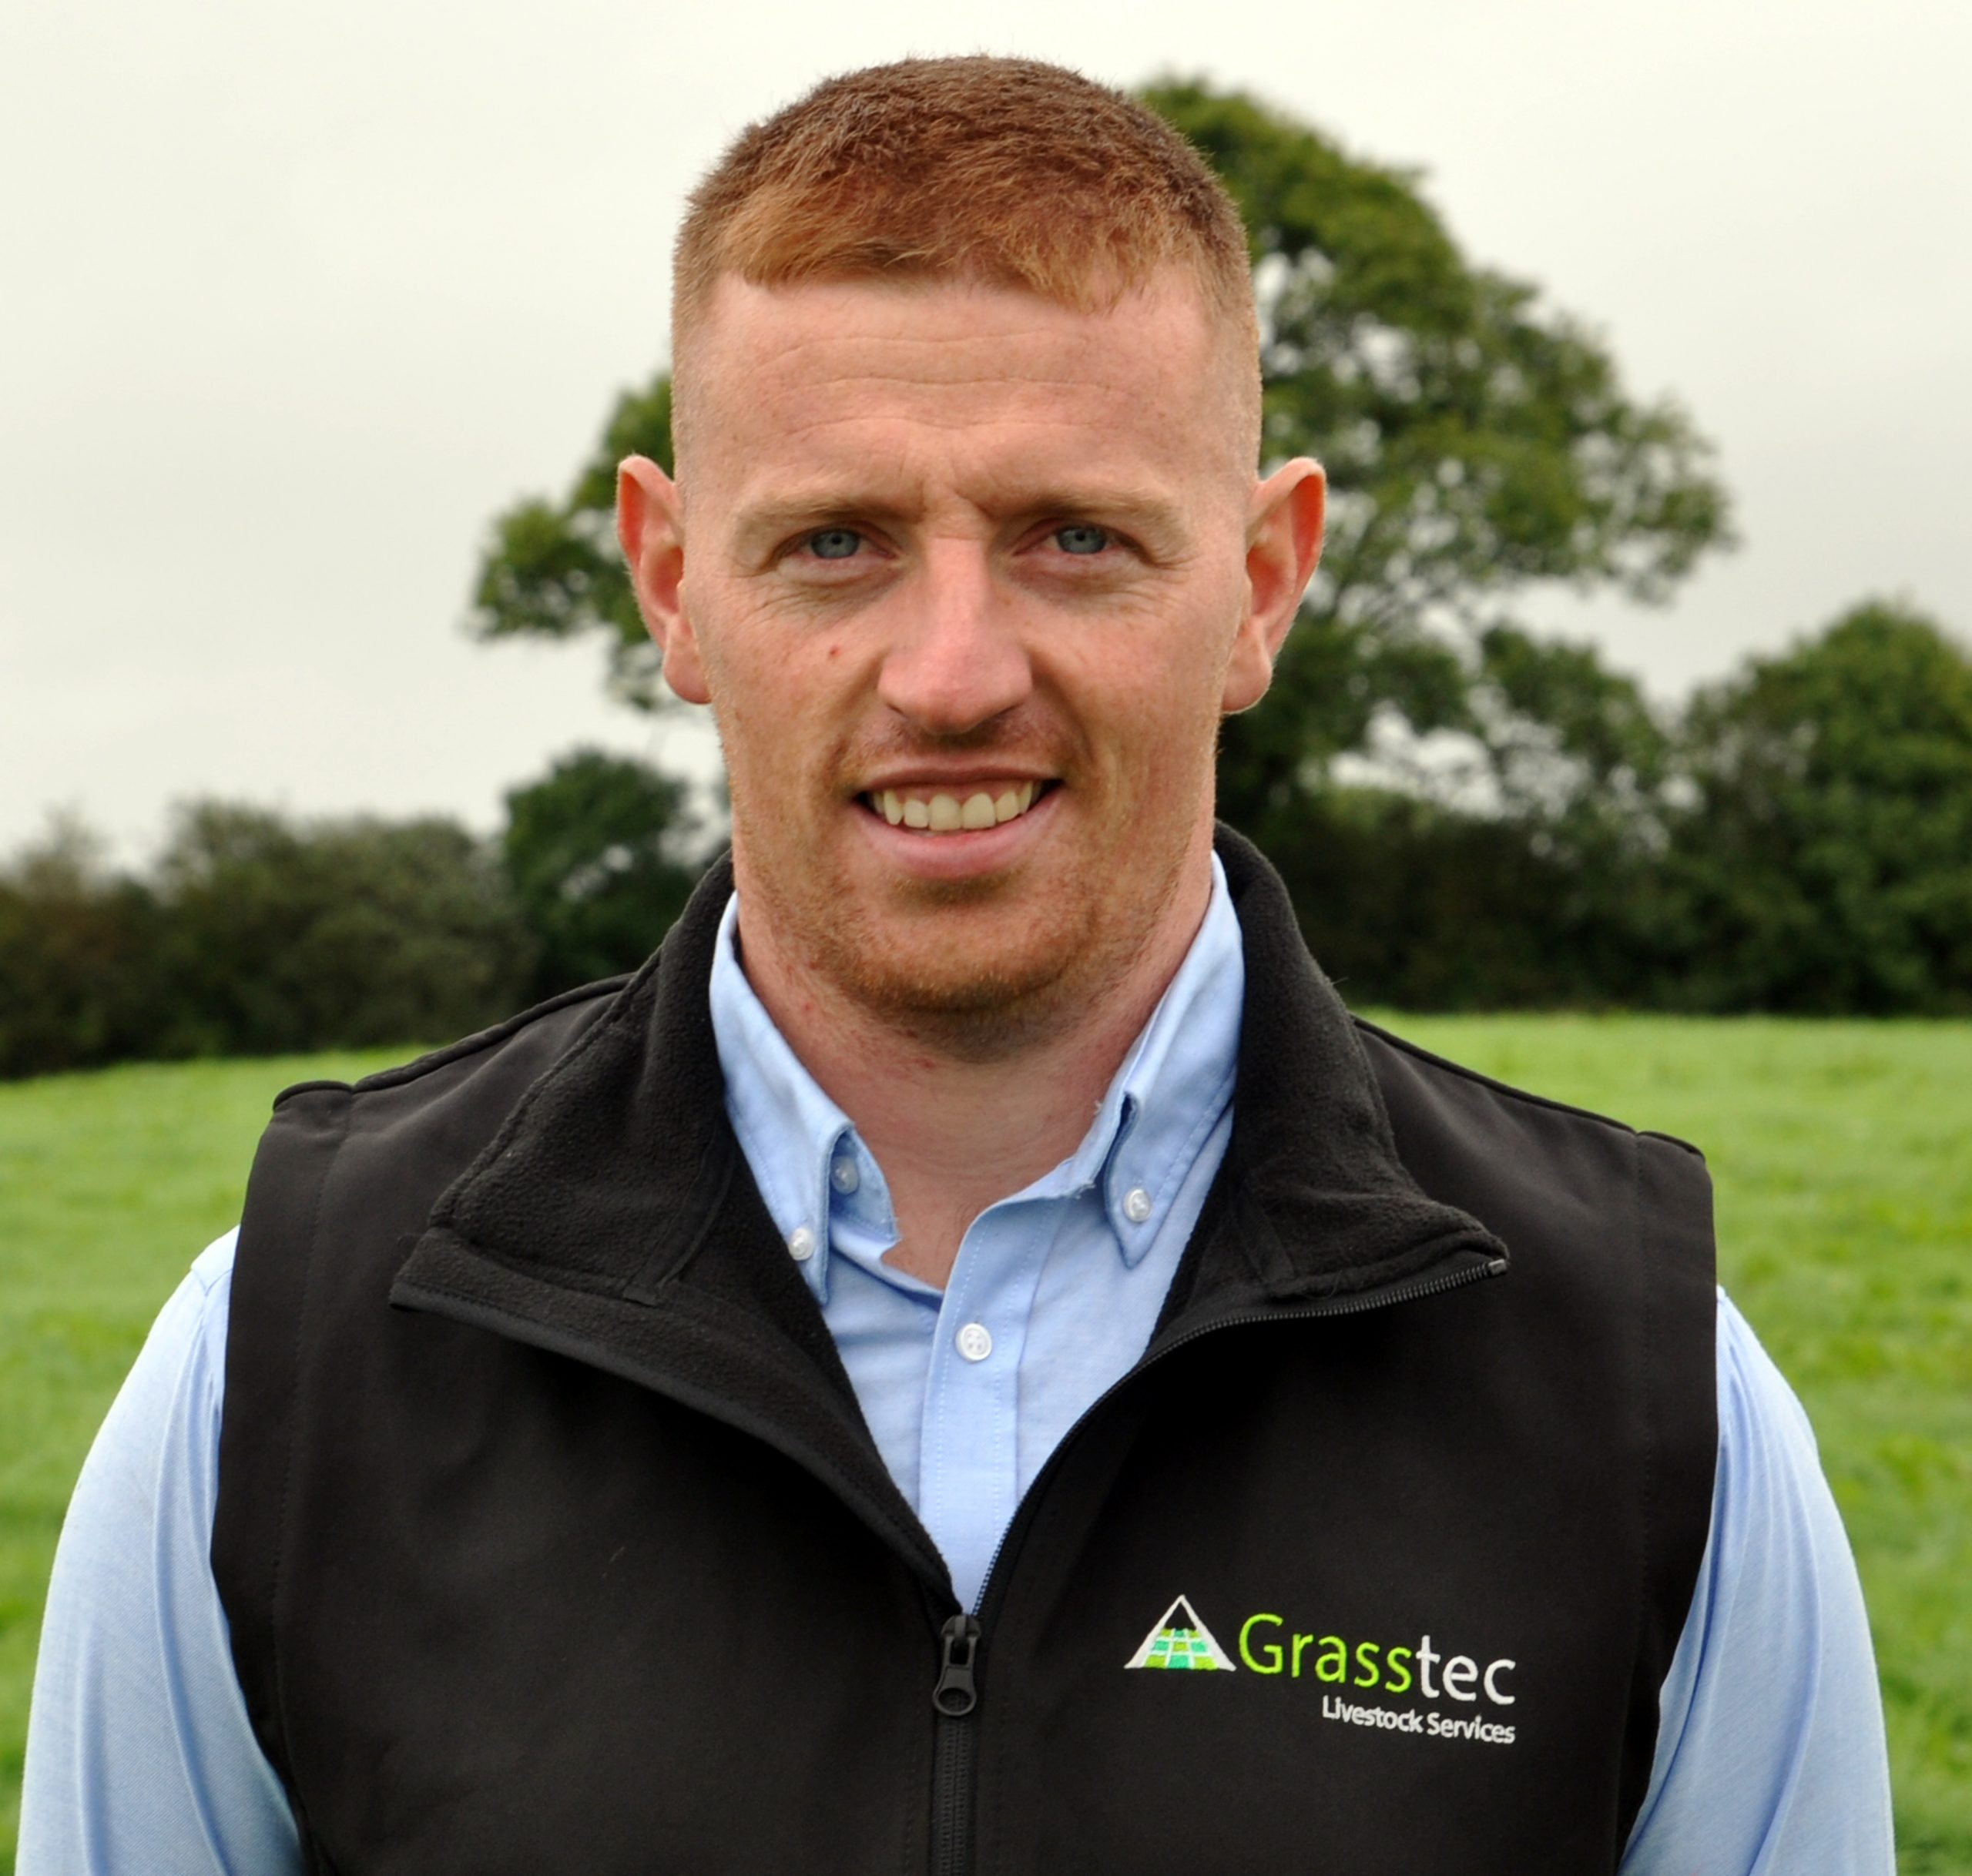 Jamie Coughlan Grasstec Livestock Department